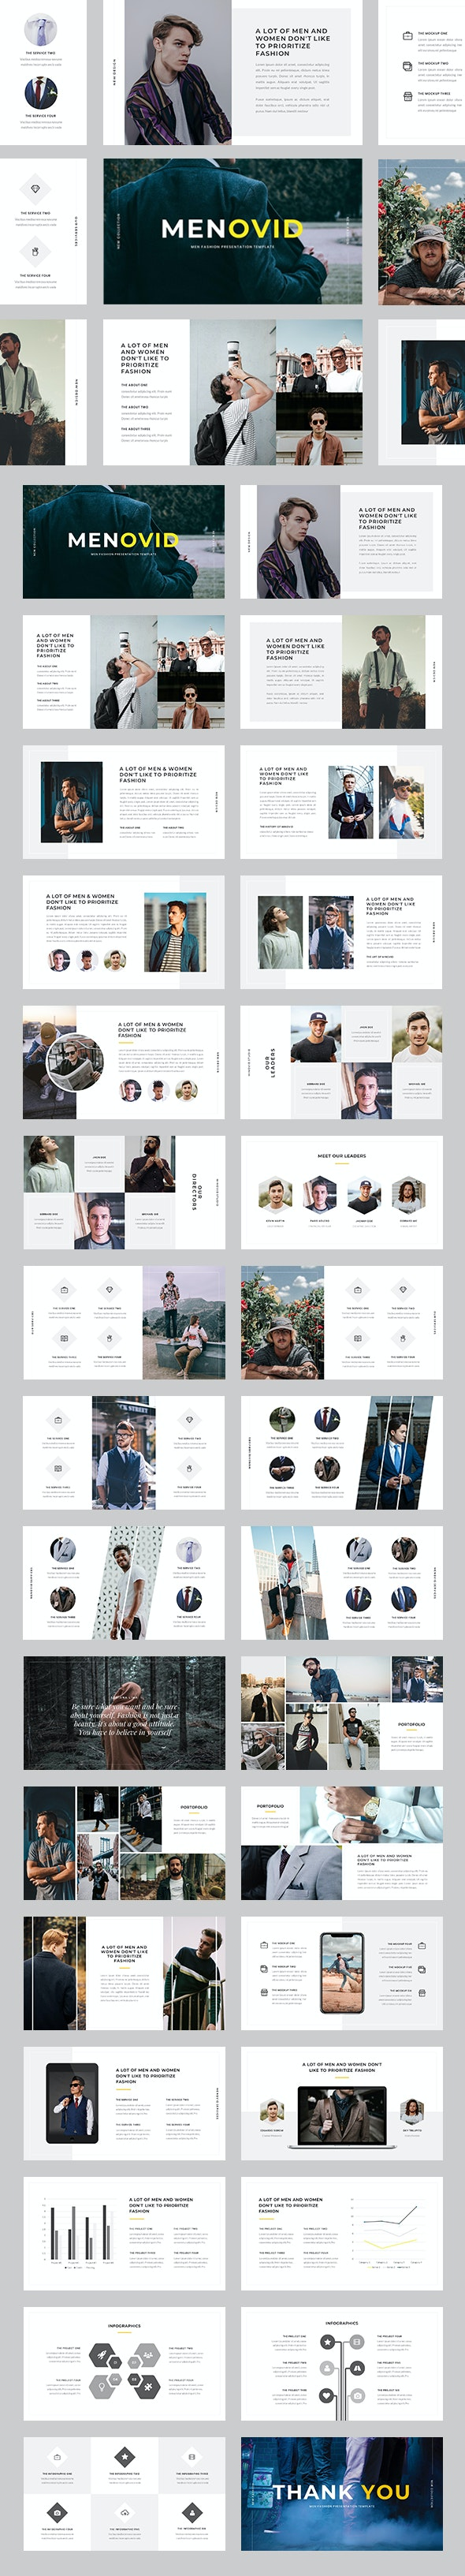 Menovid - Men Fashion PowerPoint Template - Business PowerPoint Templates